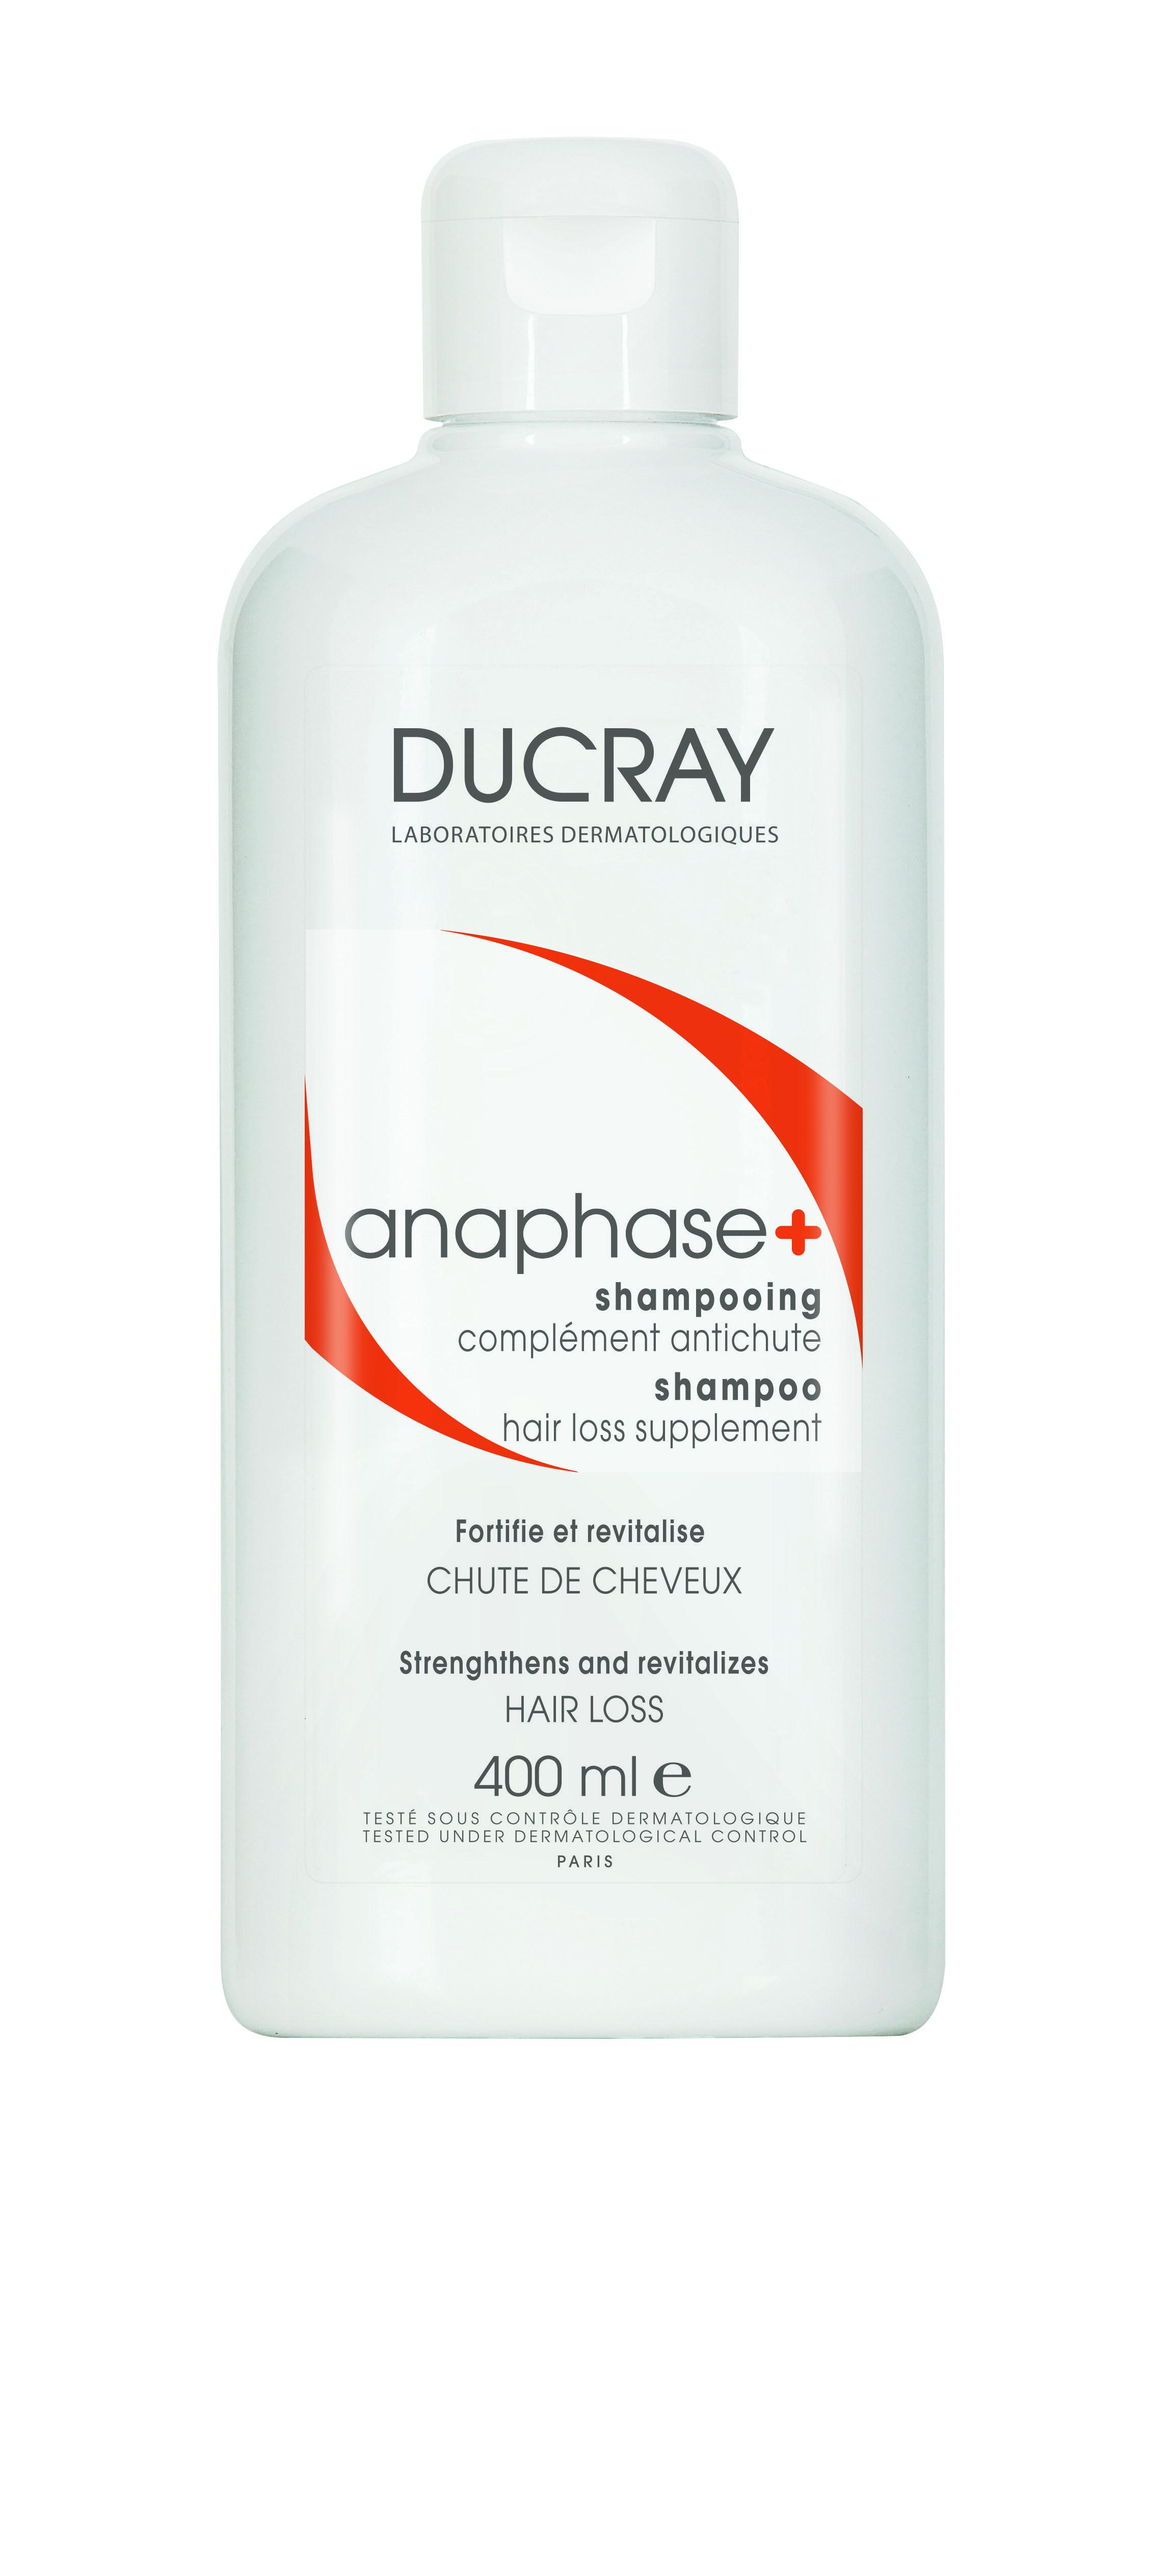 Anaphase+ Shampoo 400ml by Ducray